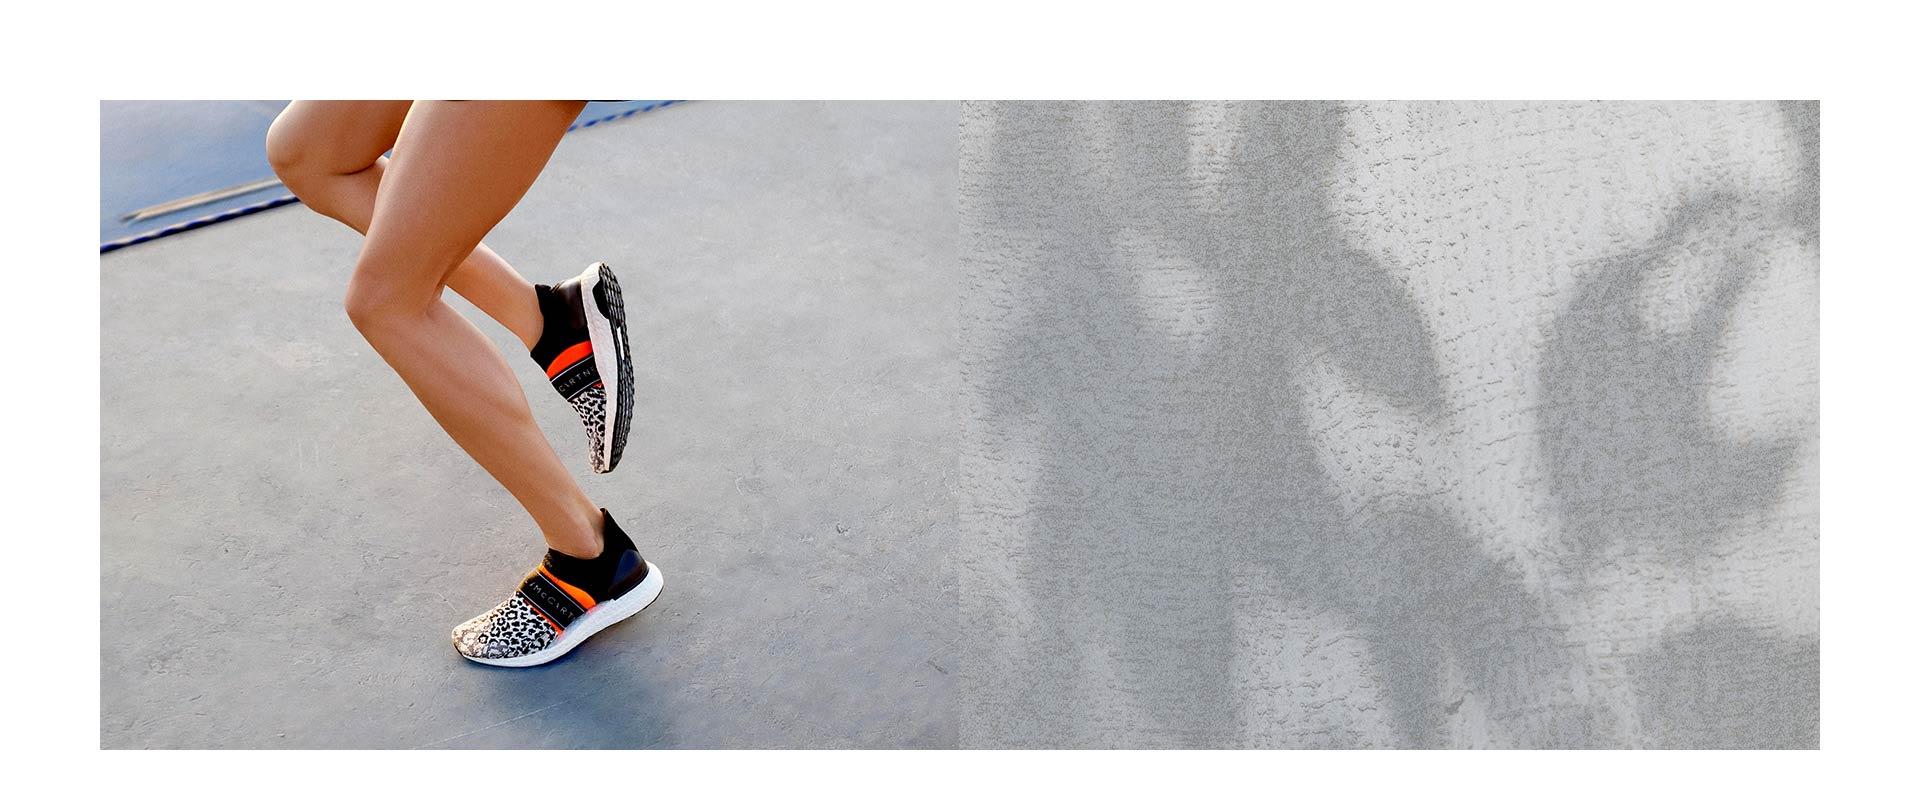 dfbce97ee670 adidas by Stella McCartney Sportswear